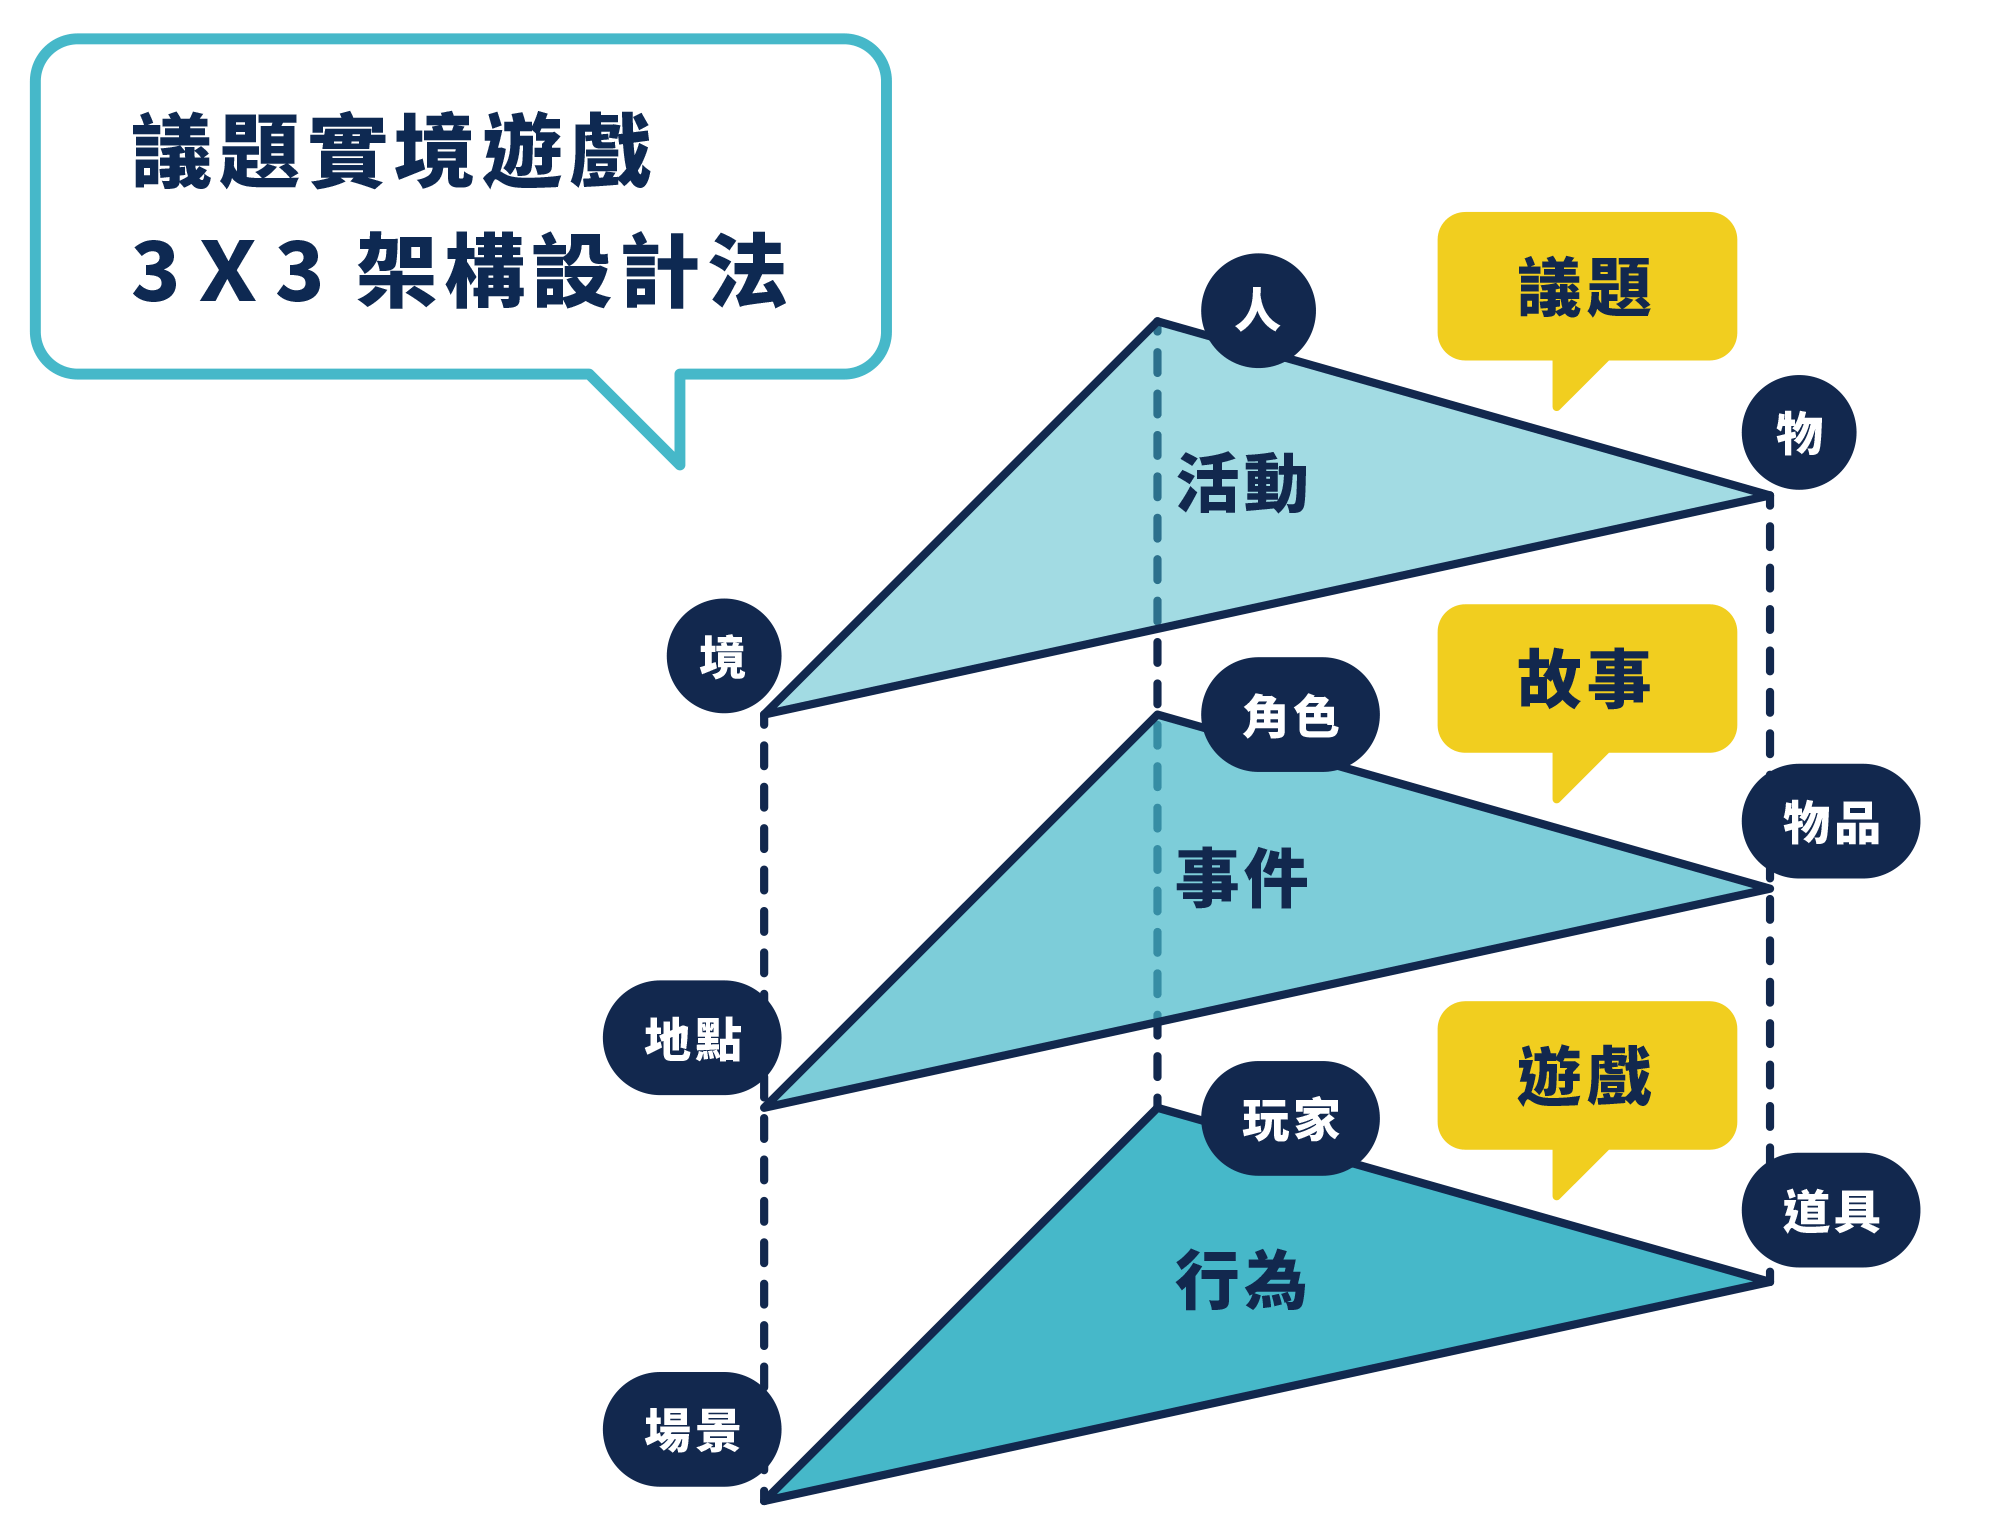 3x3架構設計法